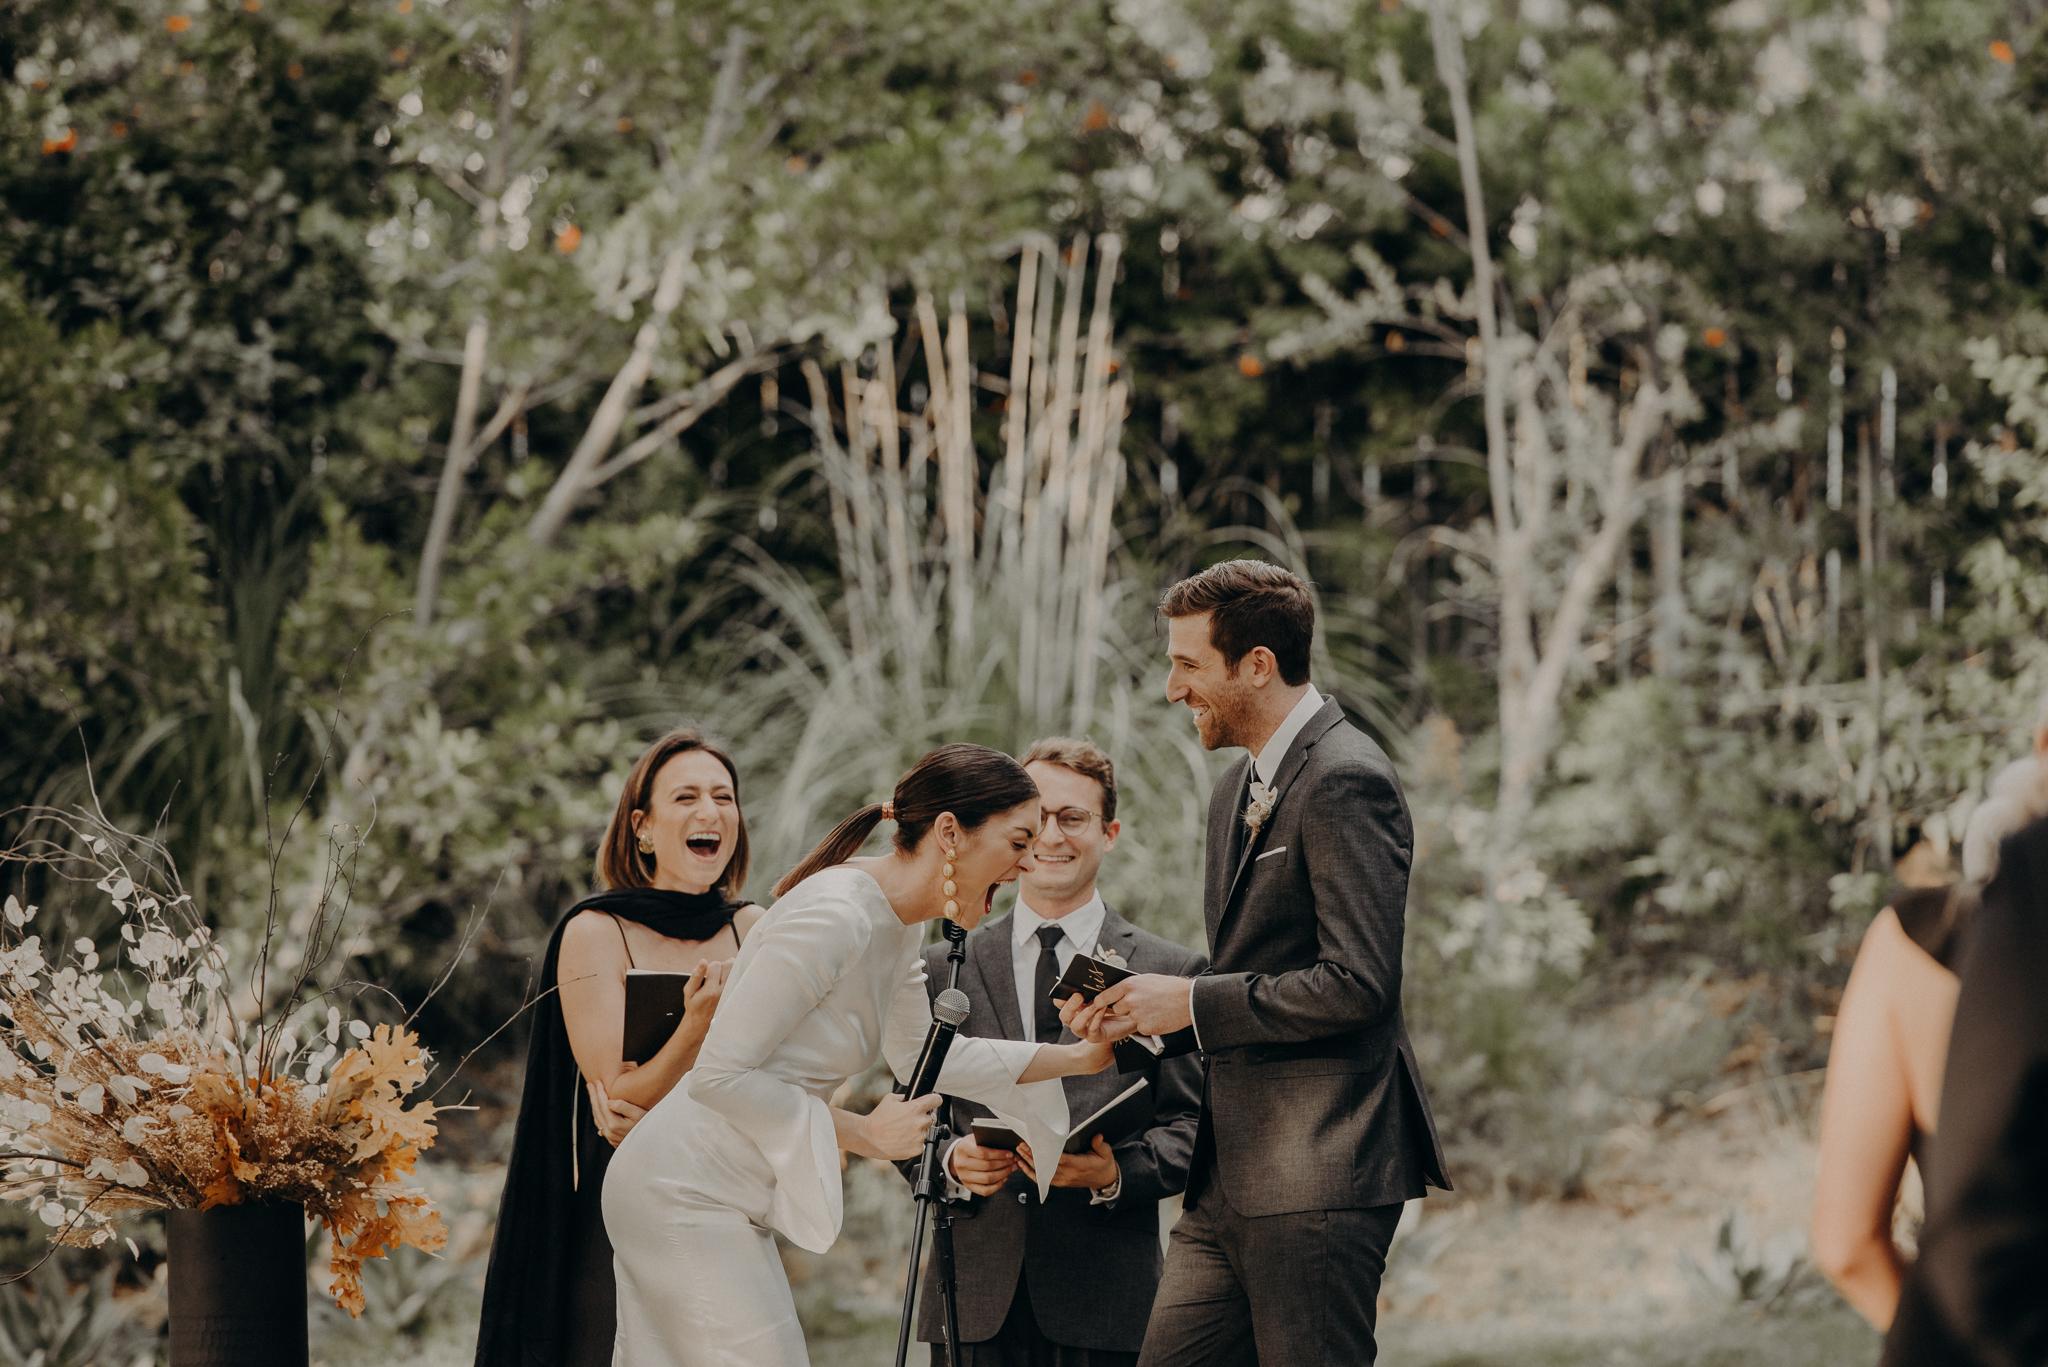 Hummingbird Nest Ranch Wedding - Wedding Photographer in Los Angeles - IsaiahAndTaylor.com-048.jpg